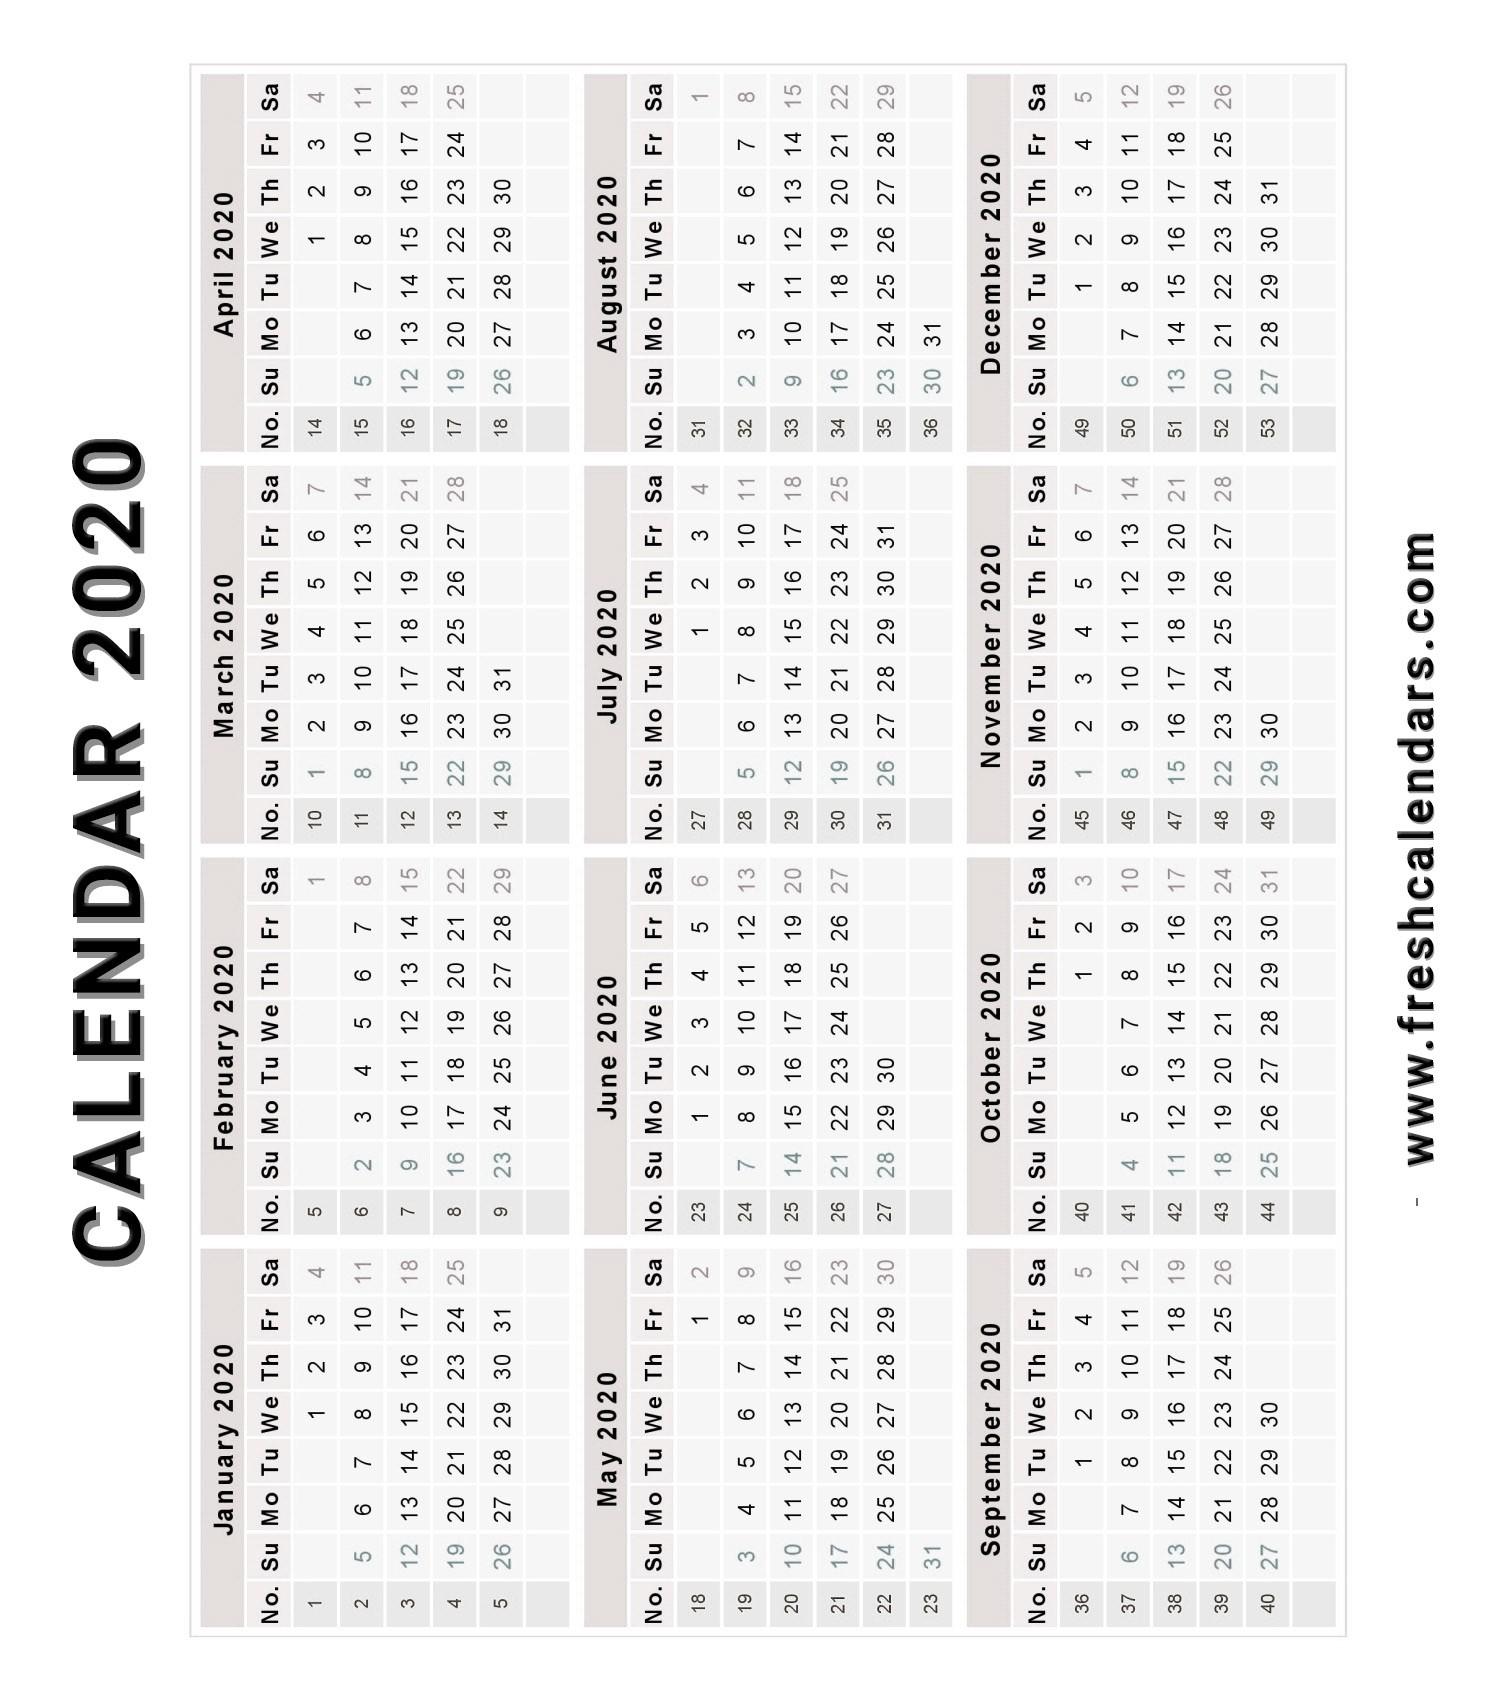 Free Printable Vertical Calendar 2020 | Month Calendar Printable-Monthly Fill In Calendar 2021